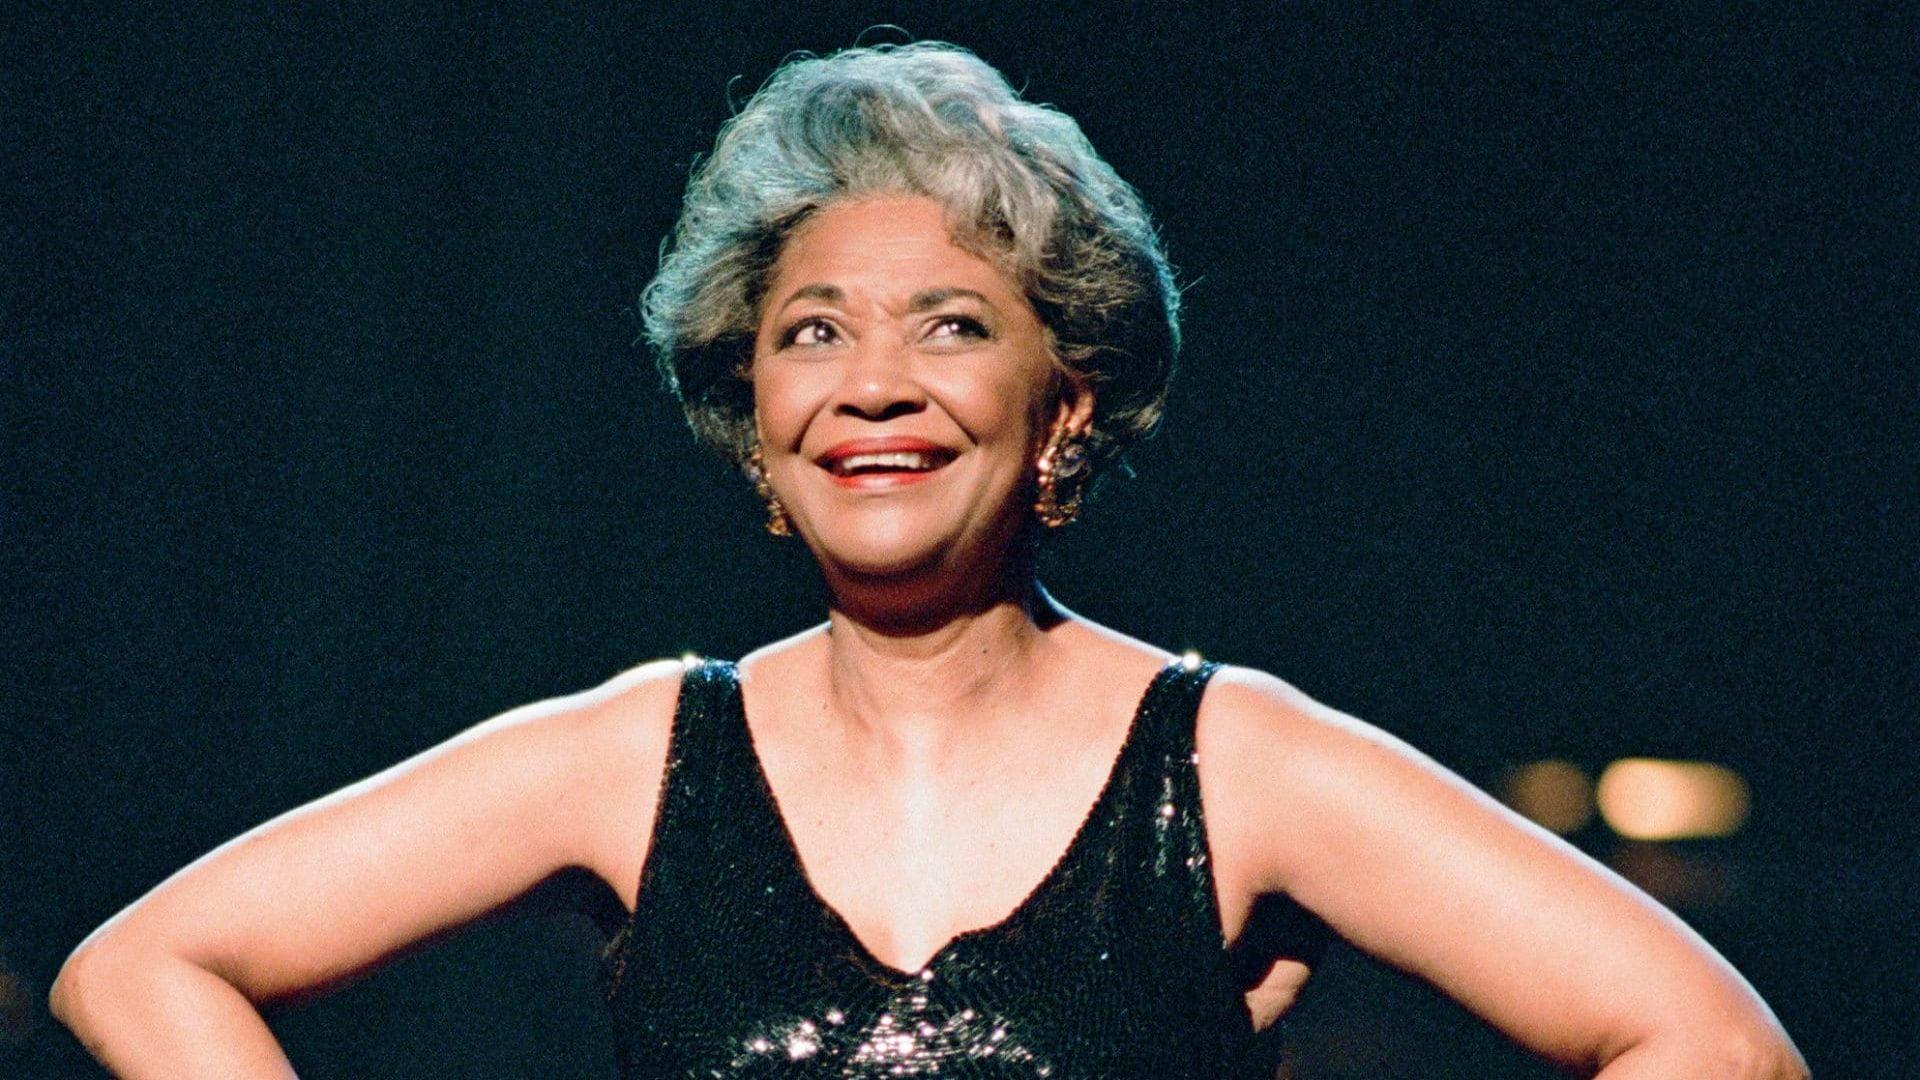 Celebrities React To The Passing Of Jazz Singer Nancy Wilson